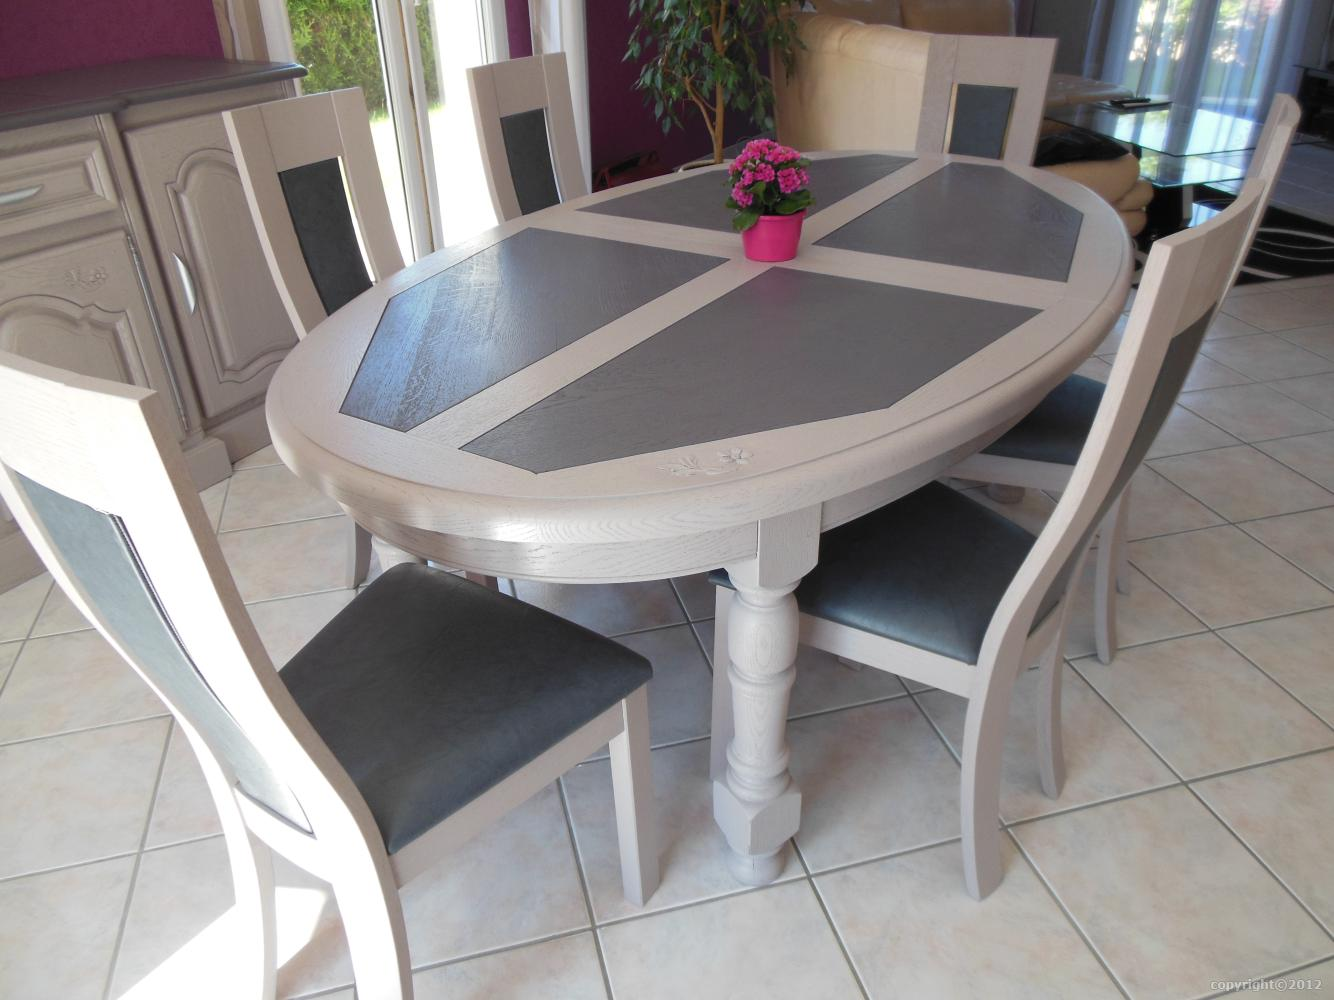 relooker vos meubles meubles sur mesure artisan relooking. Black Bedroom Furniture Sets. Home Design Ideas